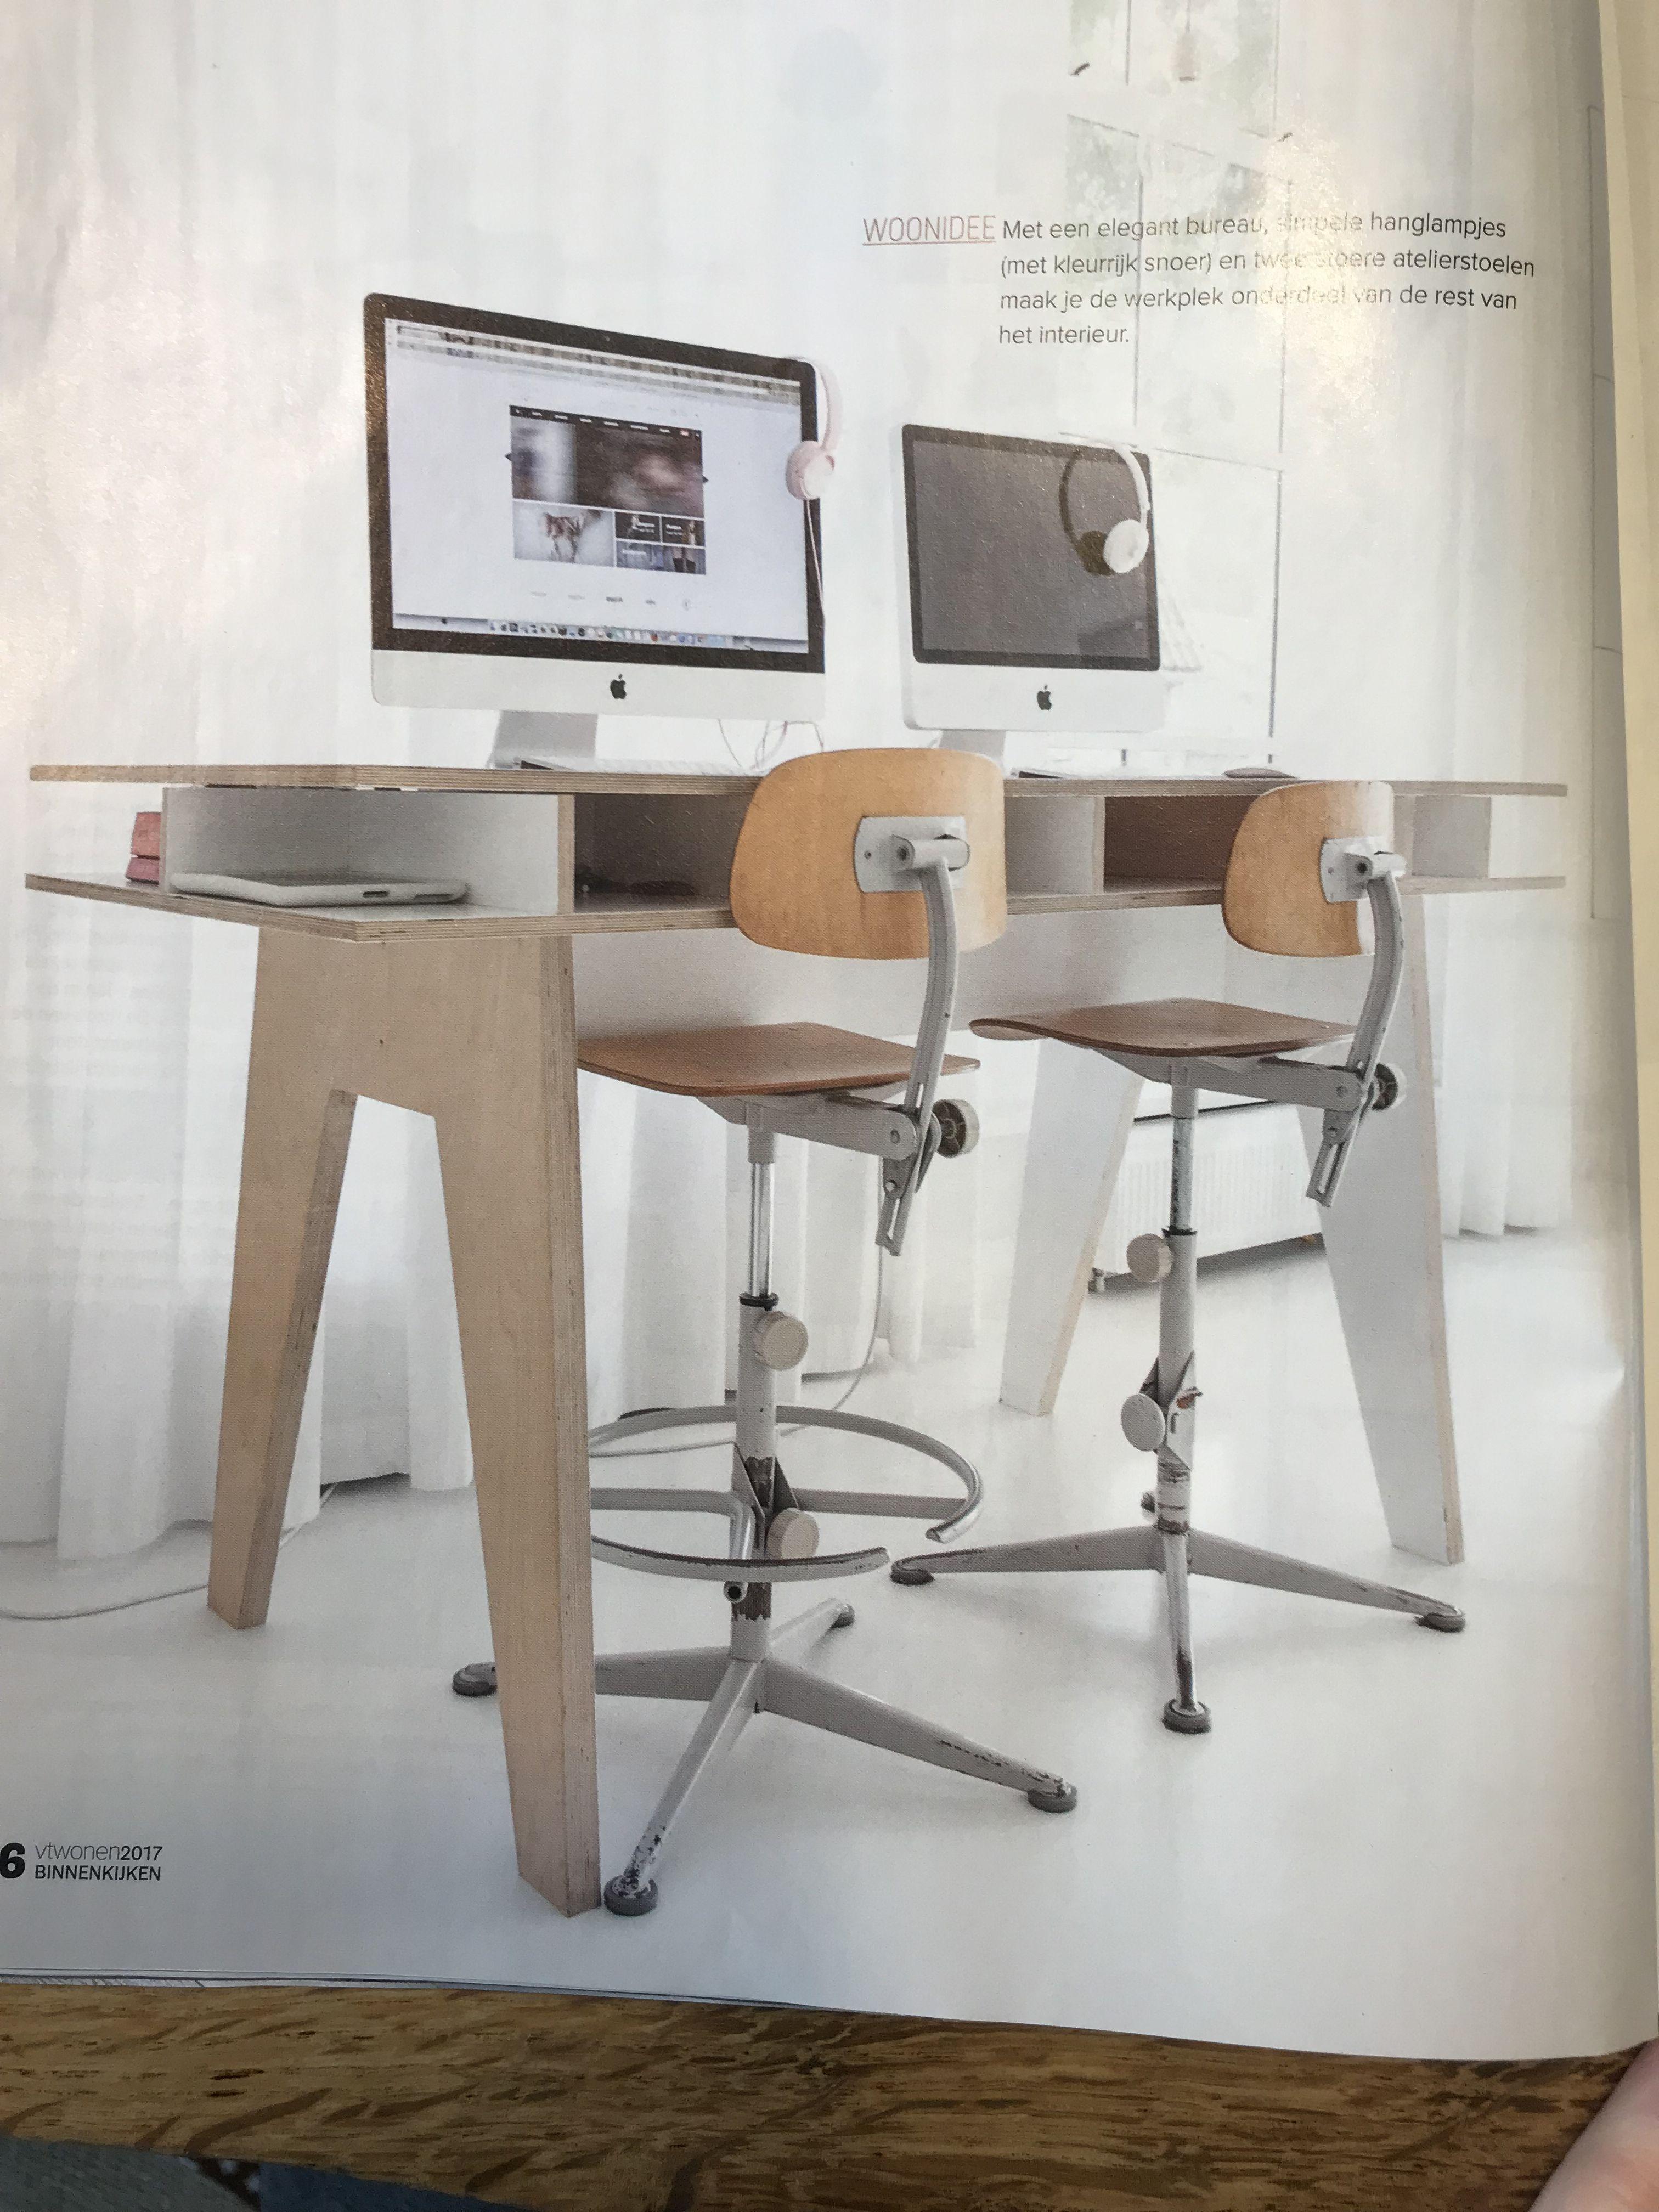 Pin by Berno van der Wal on Office design   Pinterest   Office designs